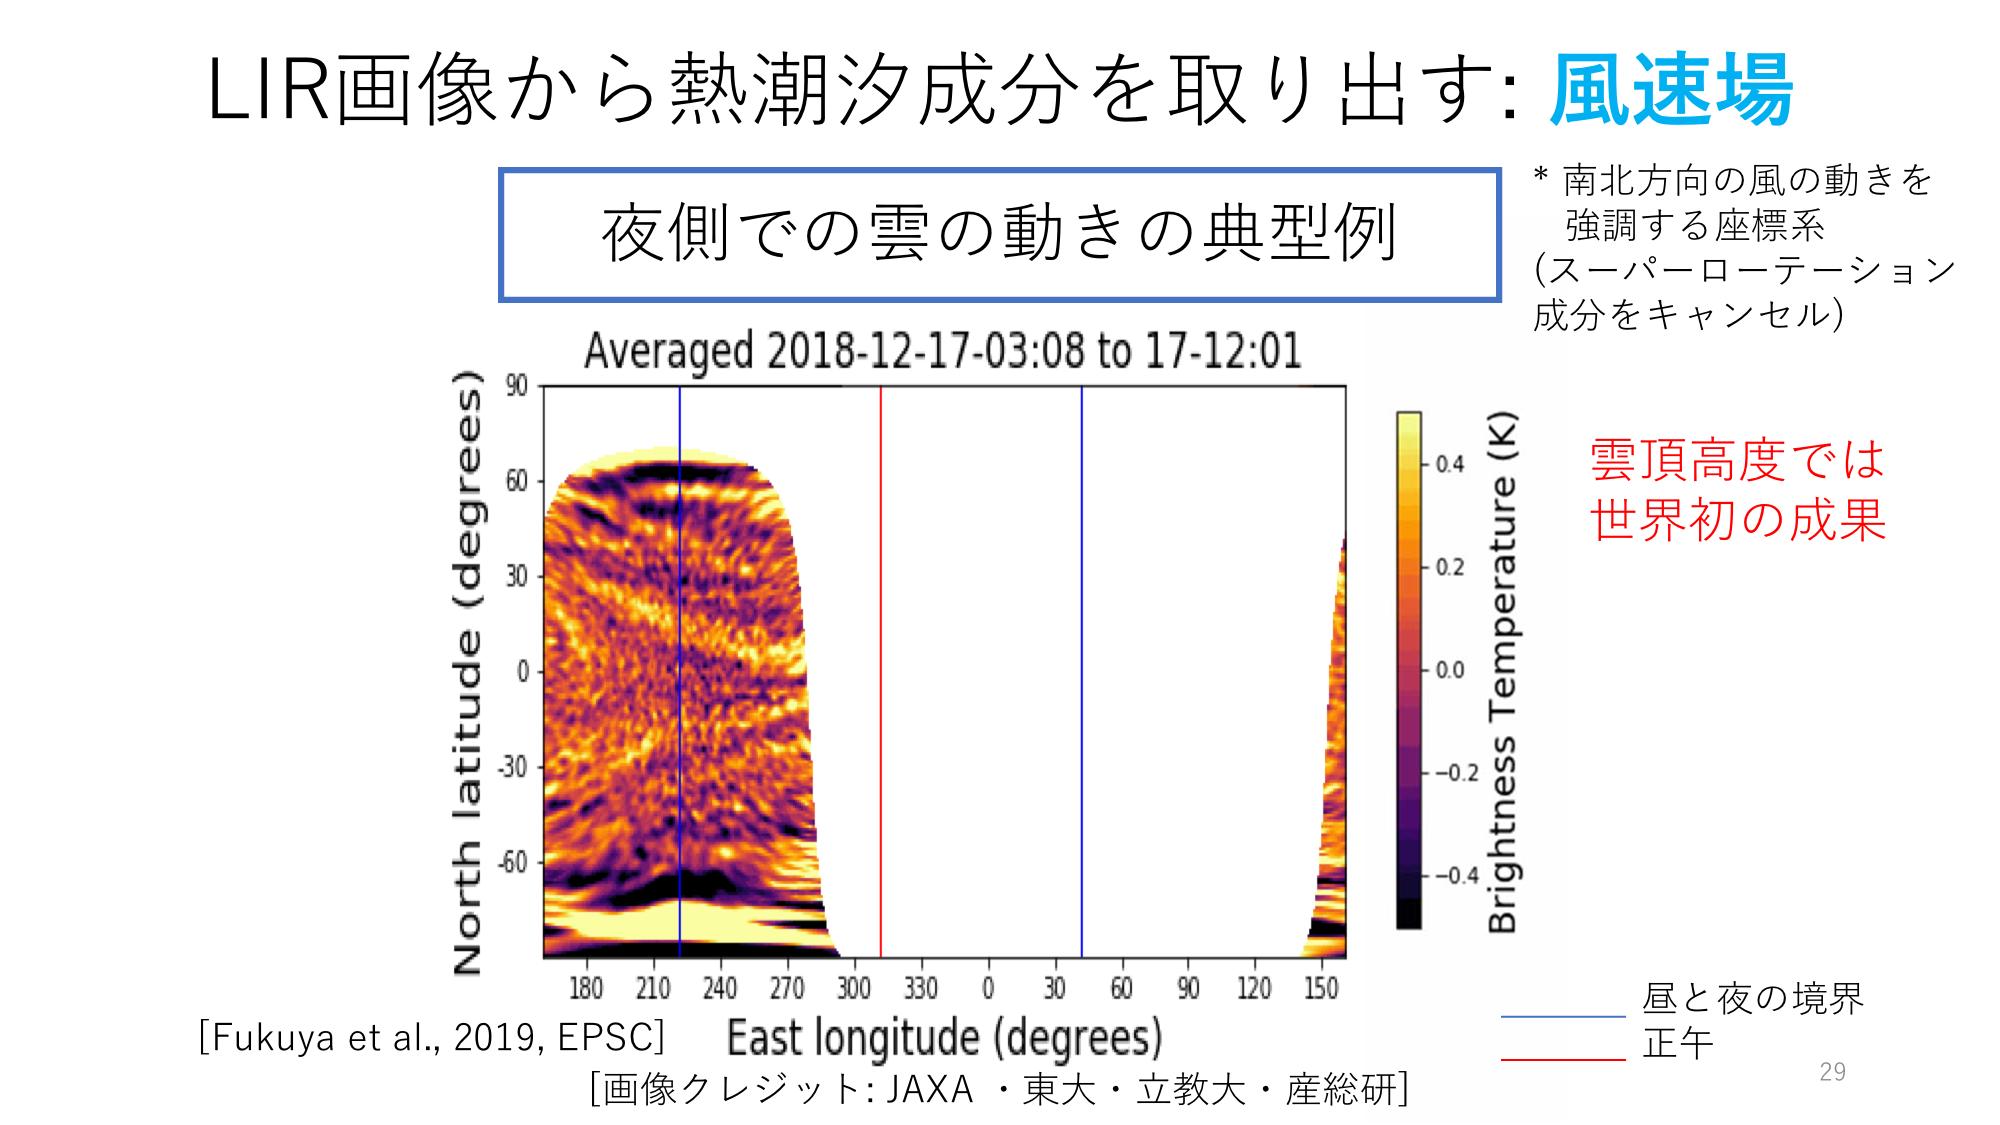 f:id:Imamura:20191119205642p:plain